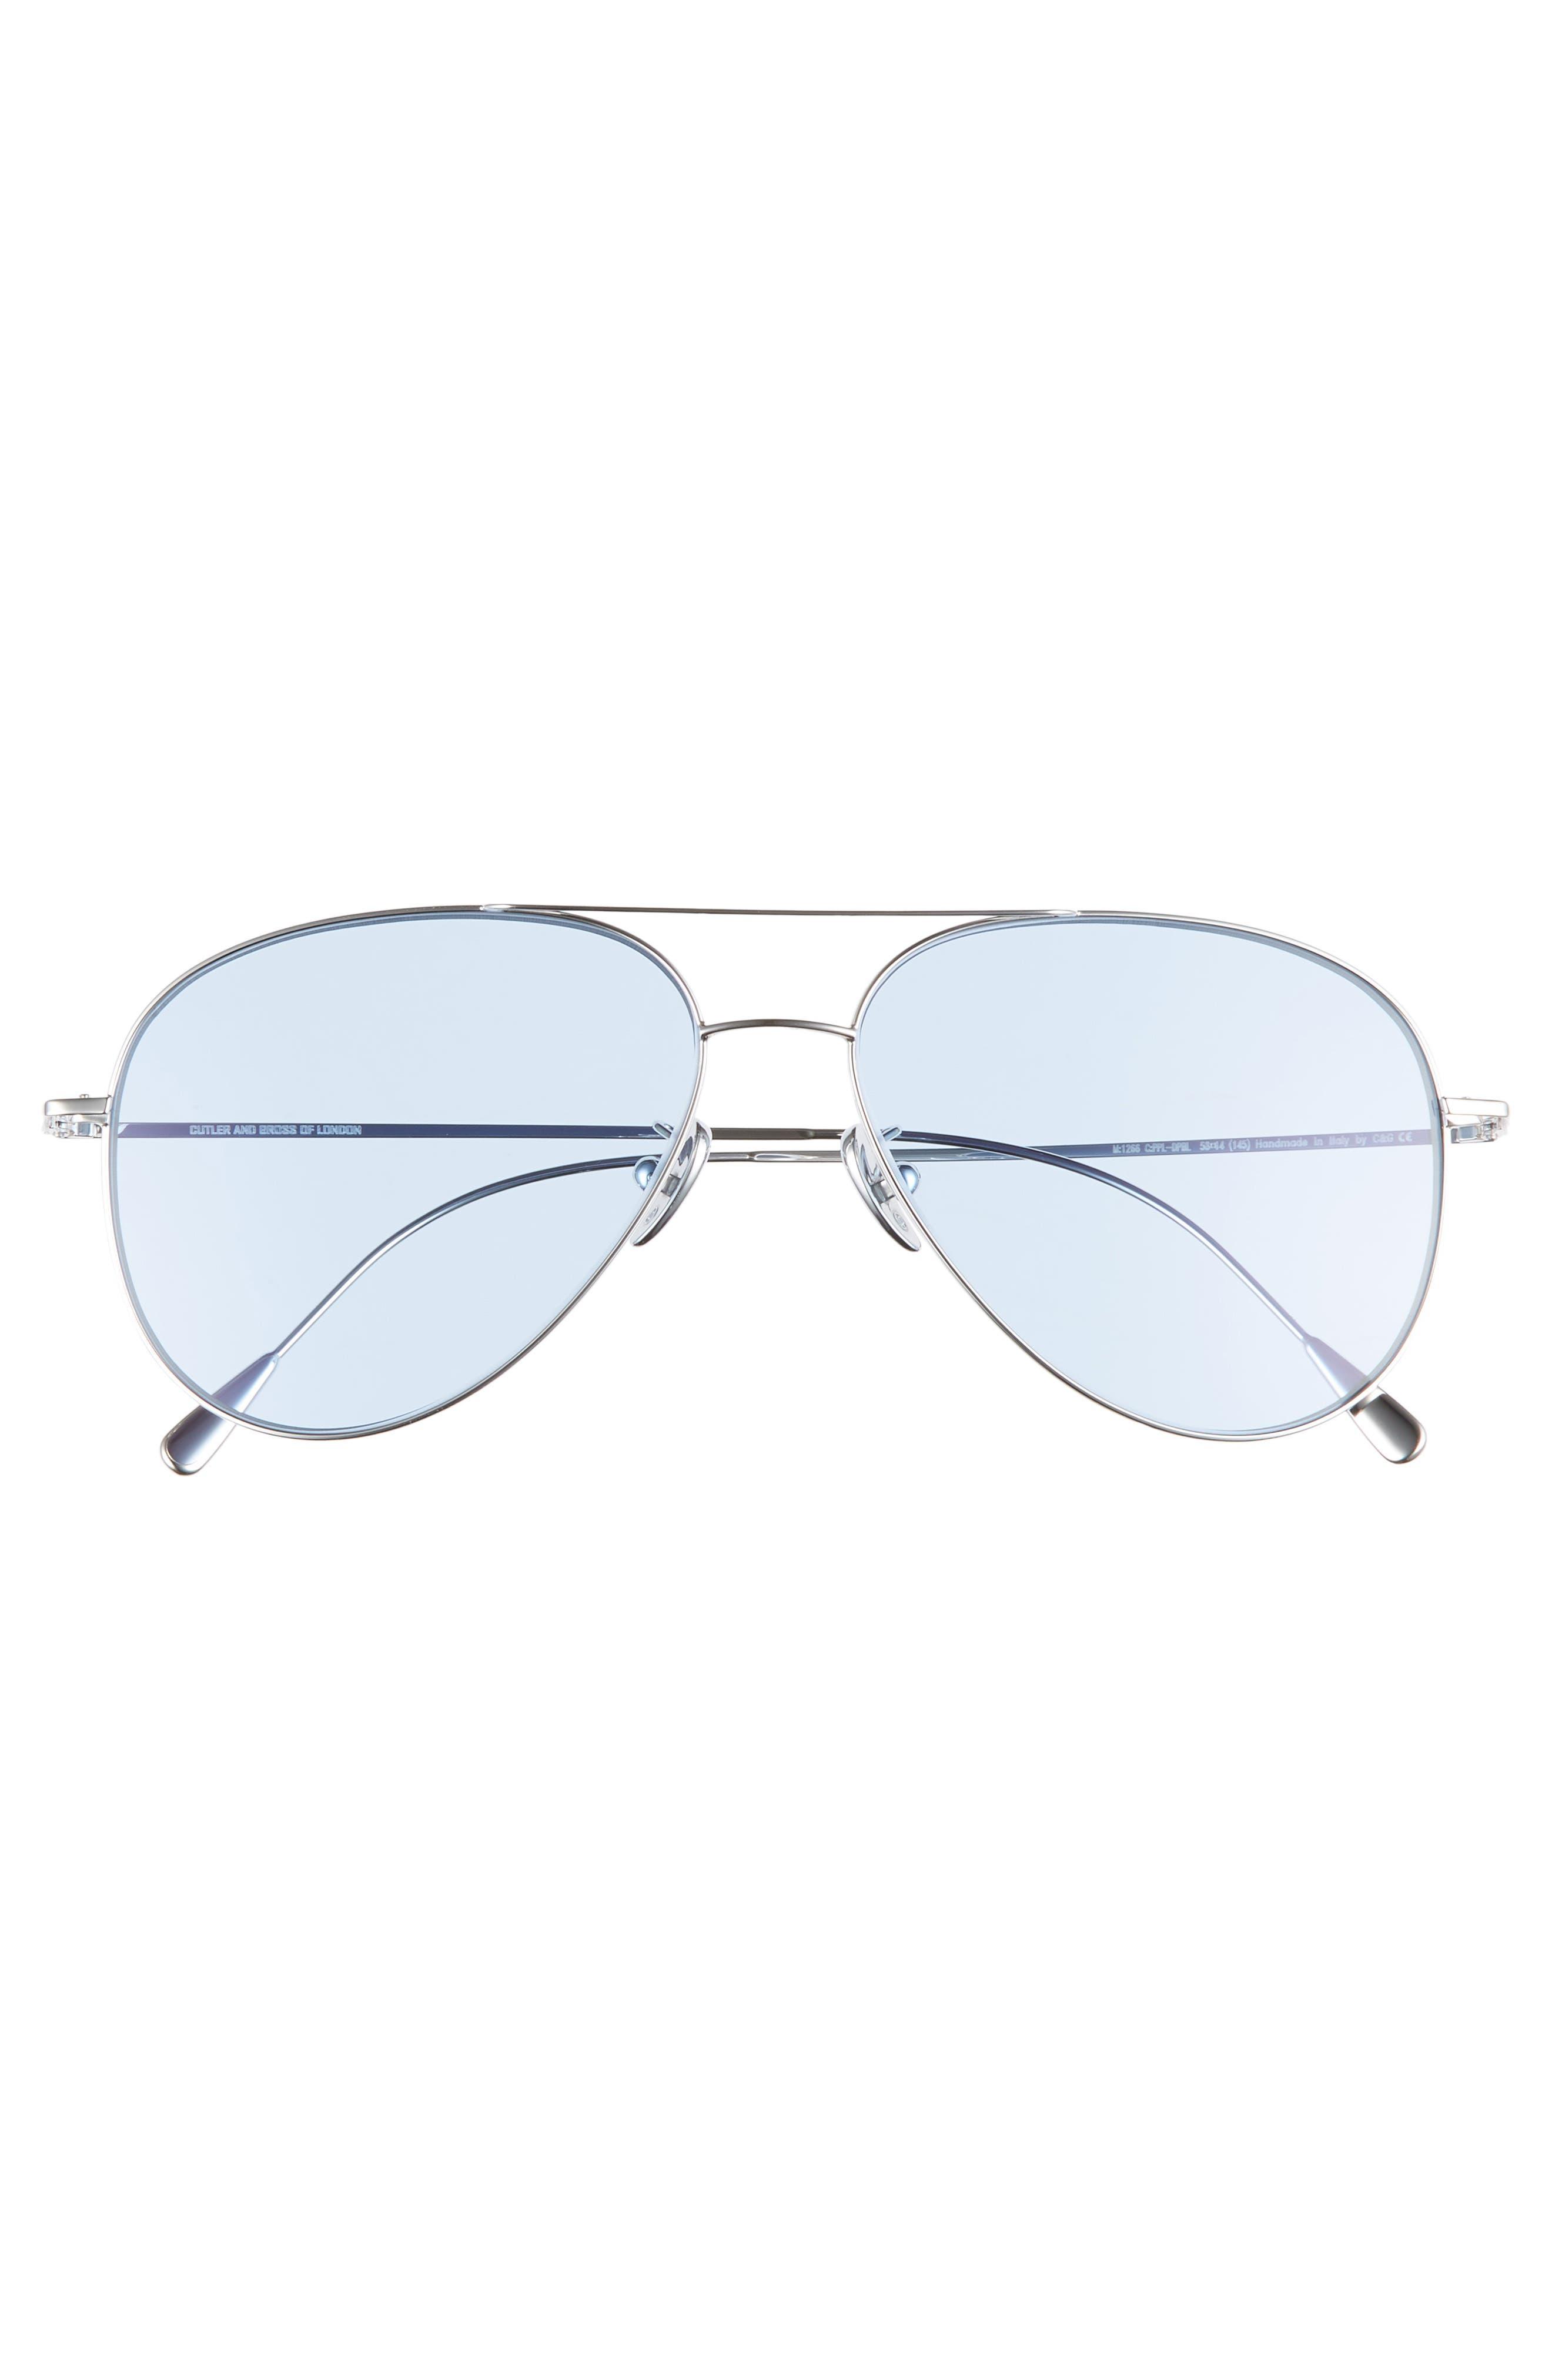 58mm Polarized Aviator Sunglasses,                             Alternate thumbnail 2, color,                             PALLADIUM/ BLUE